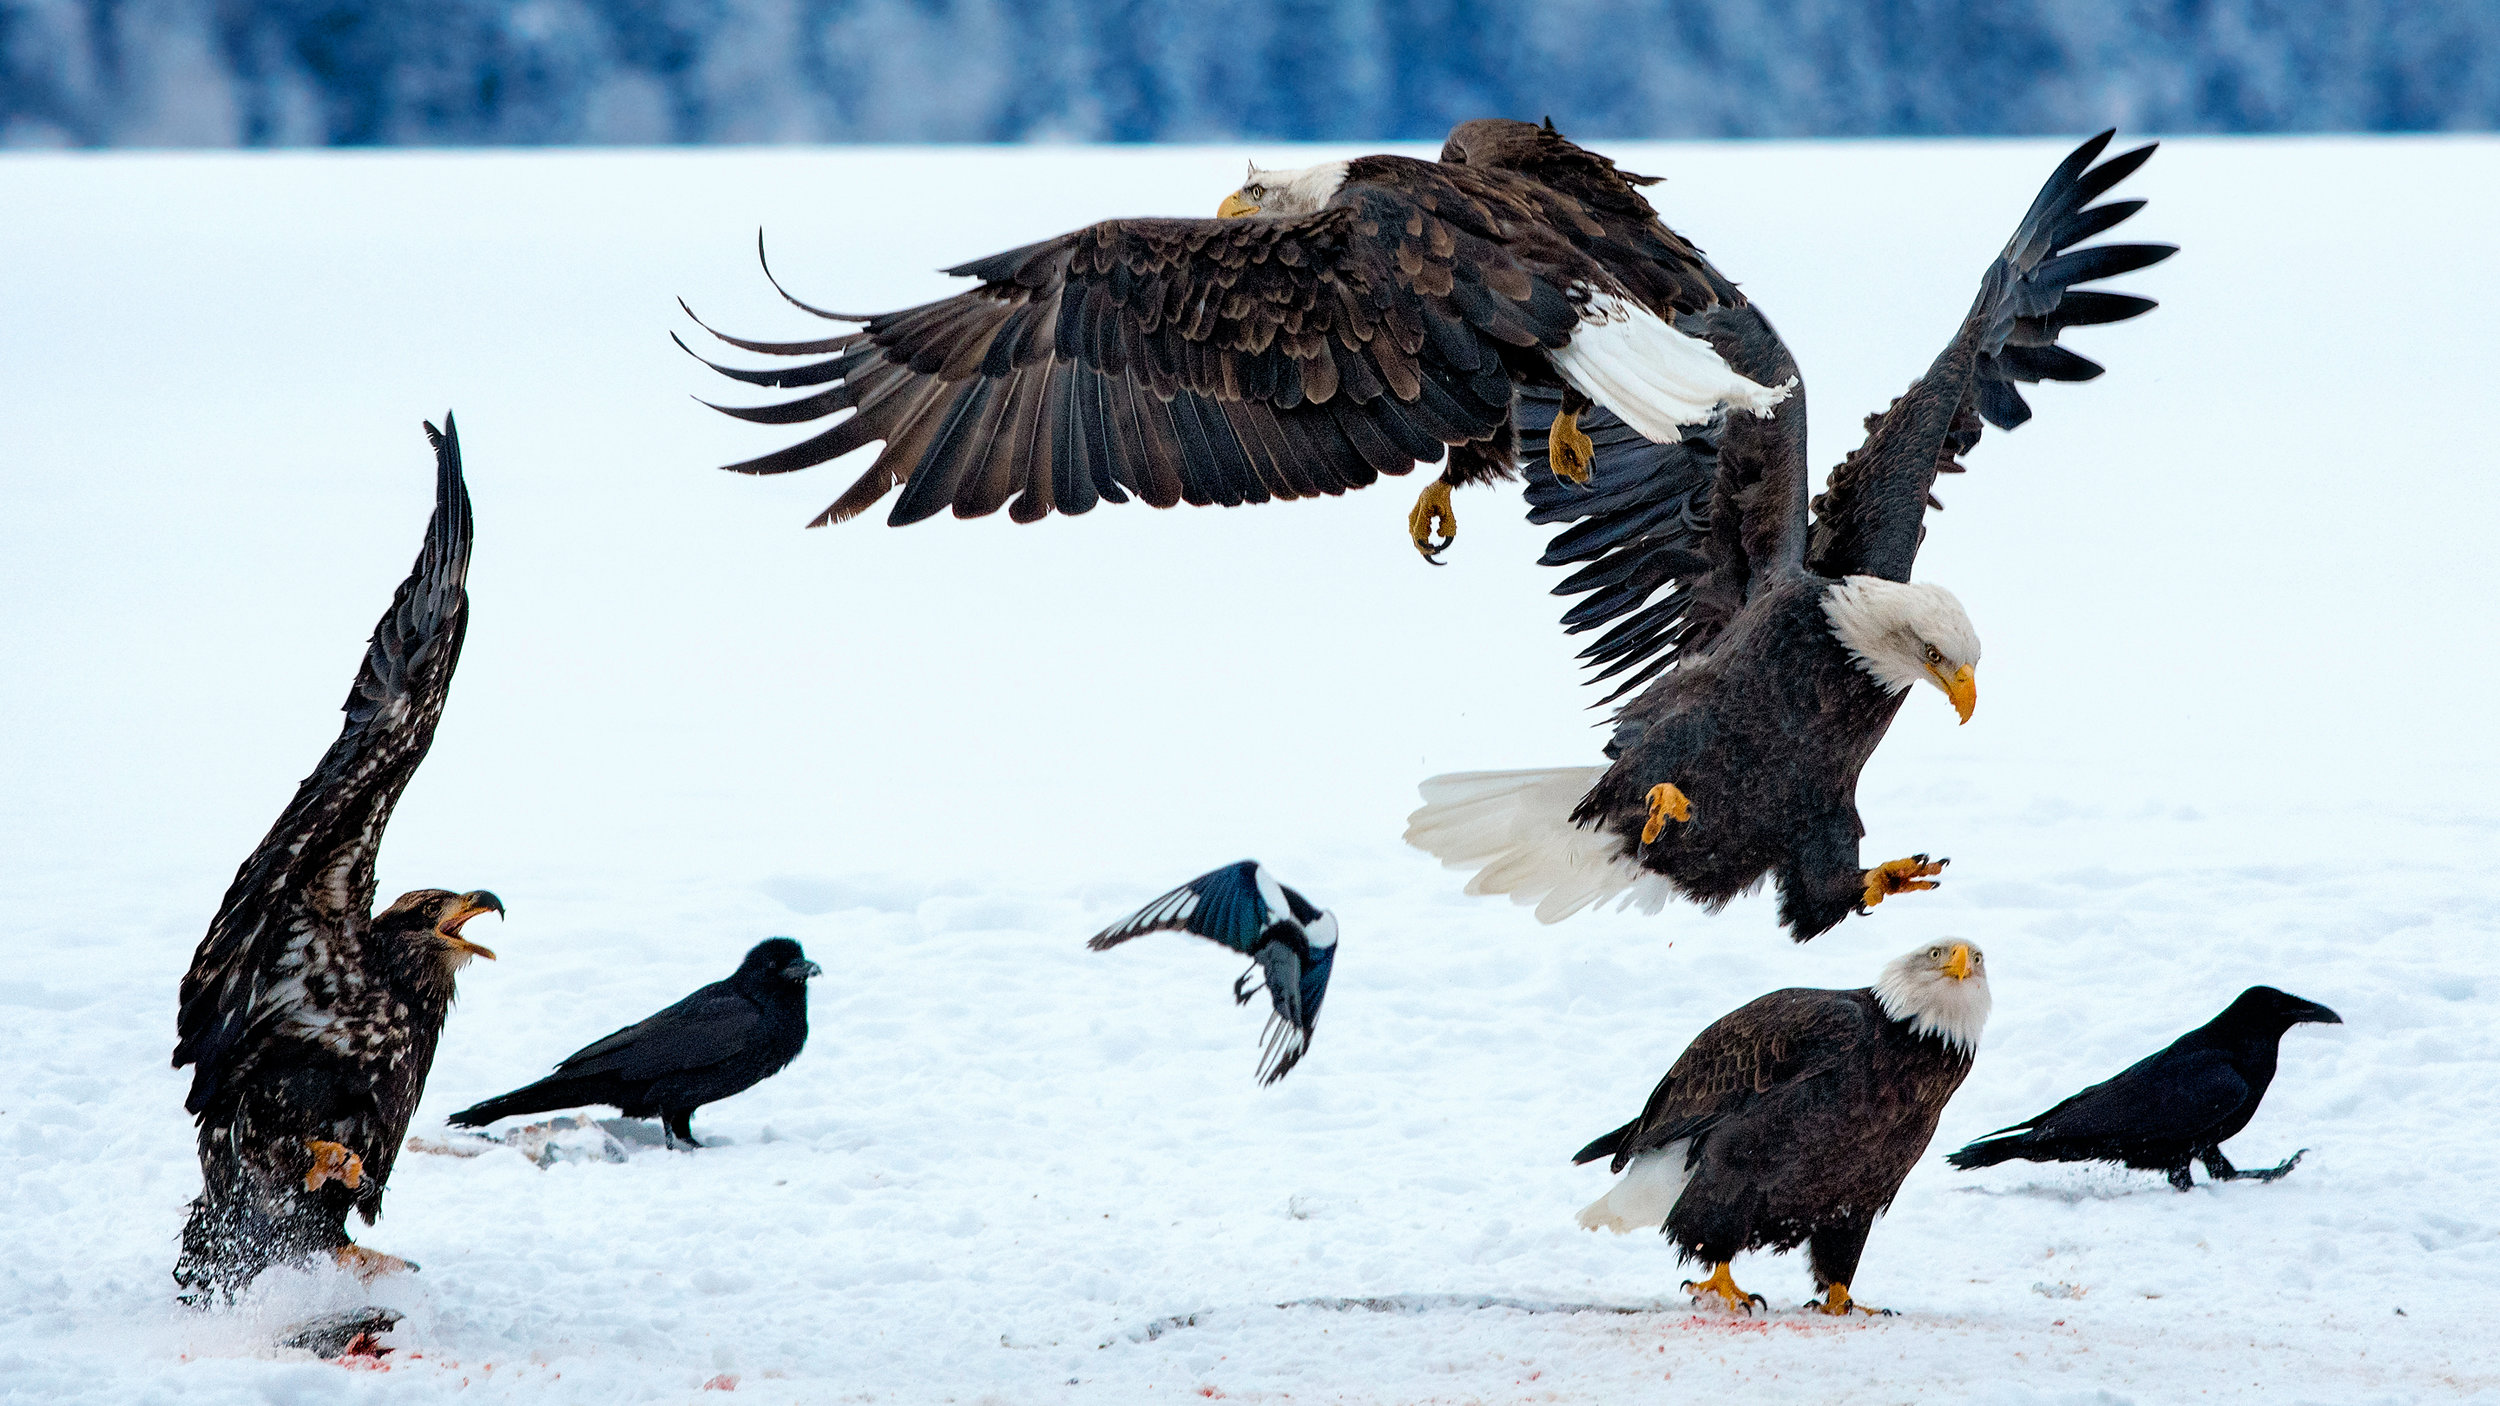 B. EaglePortfolio_Image_2_©BrianRiveraUncapher.jpg